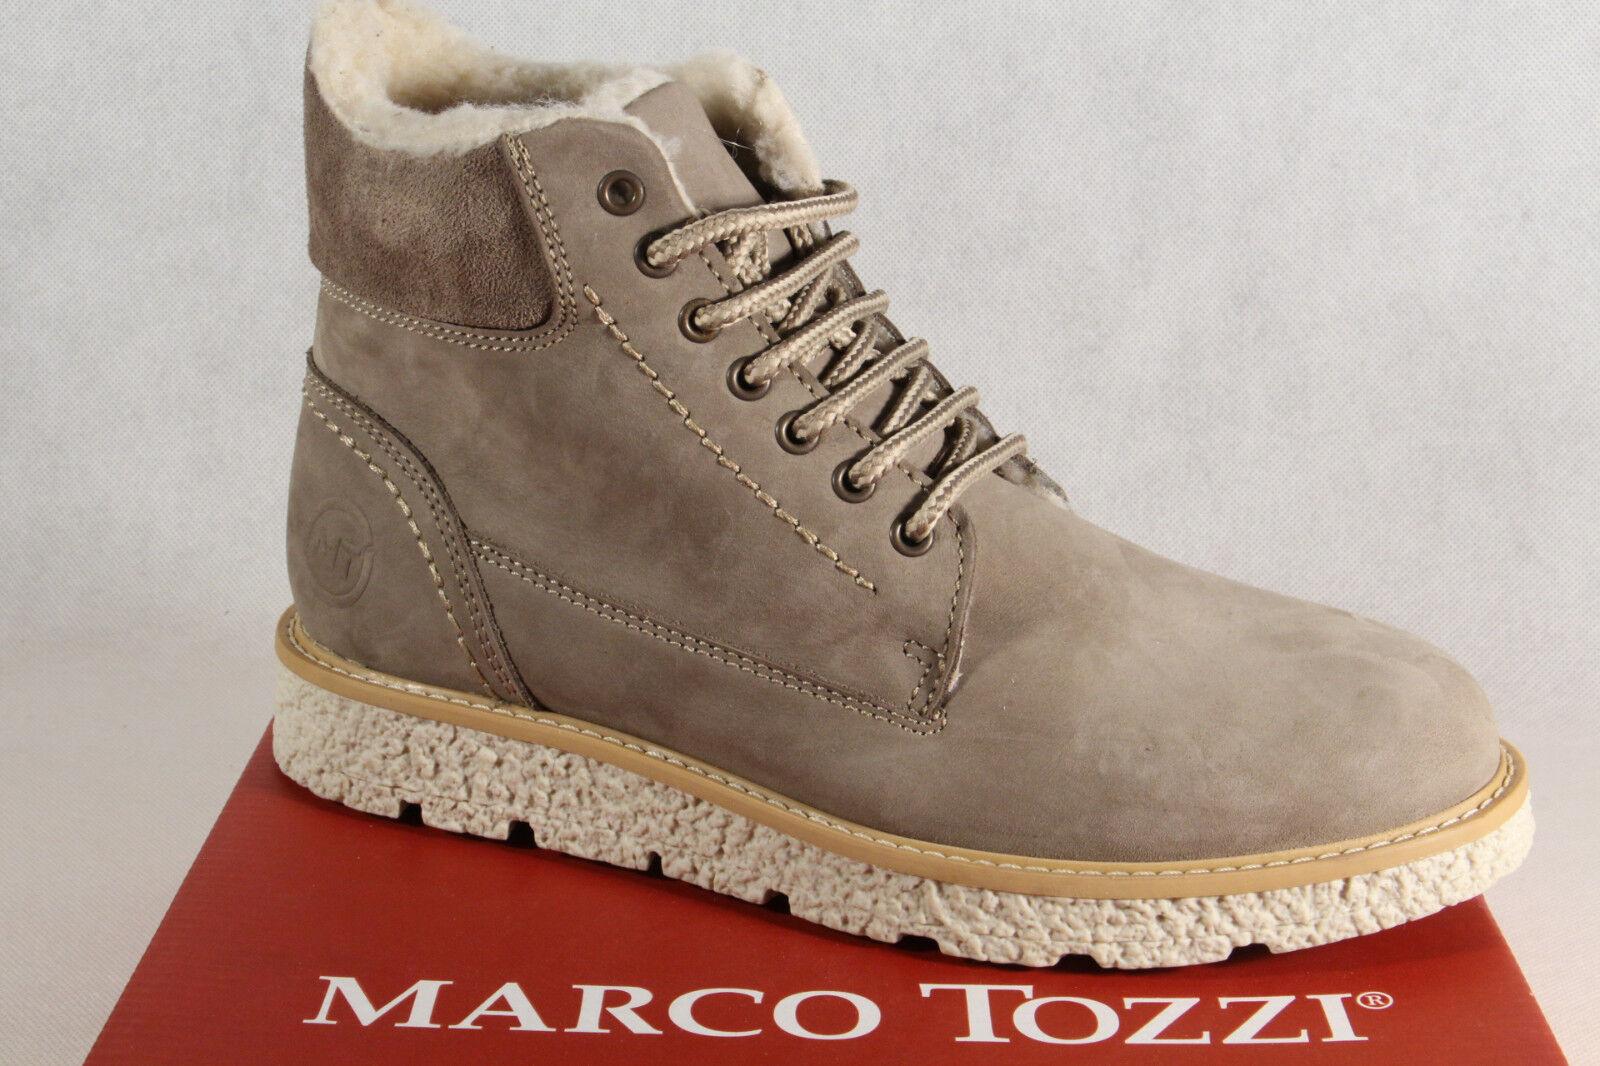 Marco Tozzi Damen Schnürstiefel Stiefel 26255 Stiefeletten Stiefel Schnürstiefel Damen taupe NEU 9240cb